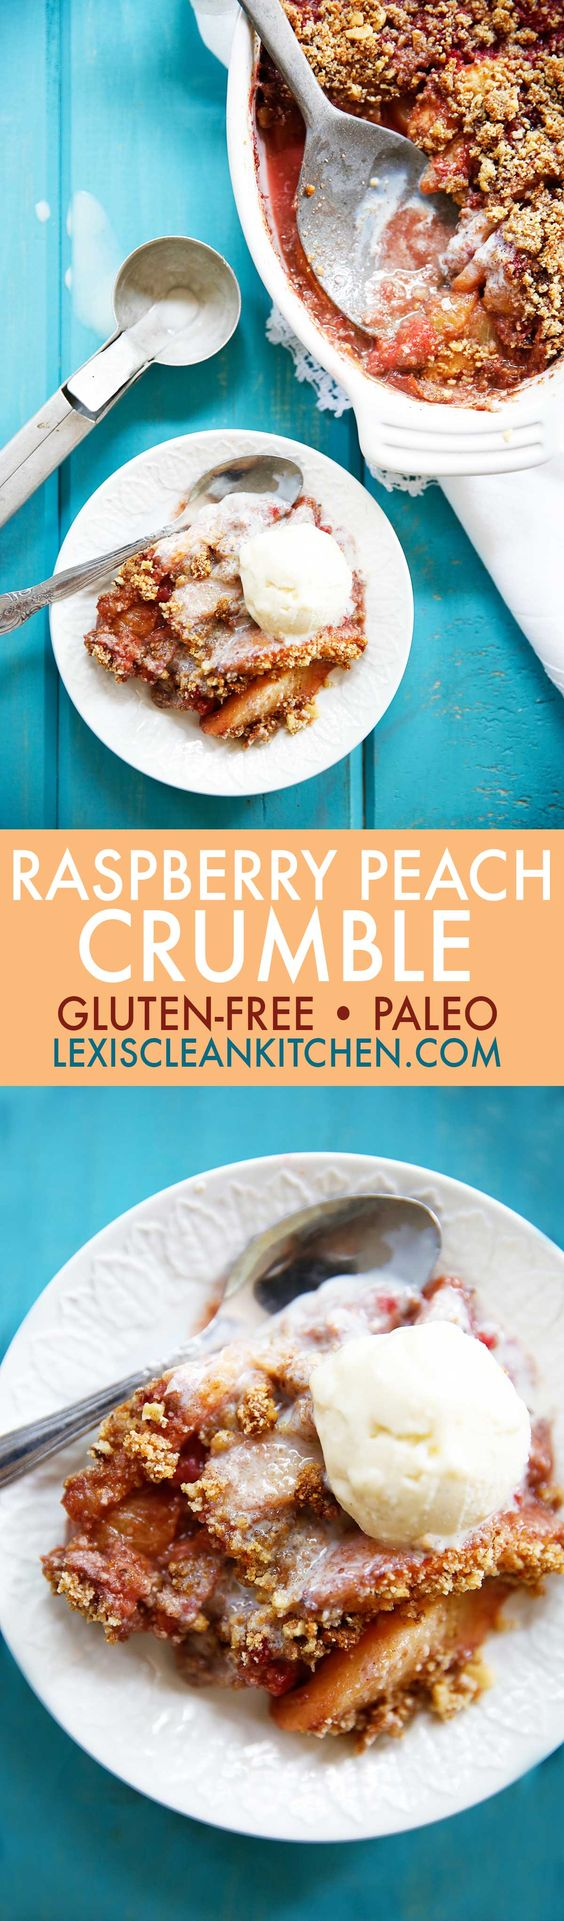 Raspberry Peach Crumble {Dairyfree, eggfree, paleo